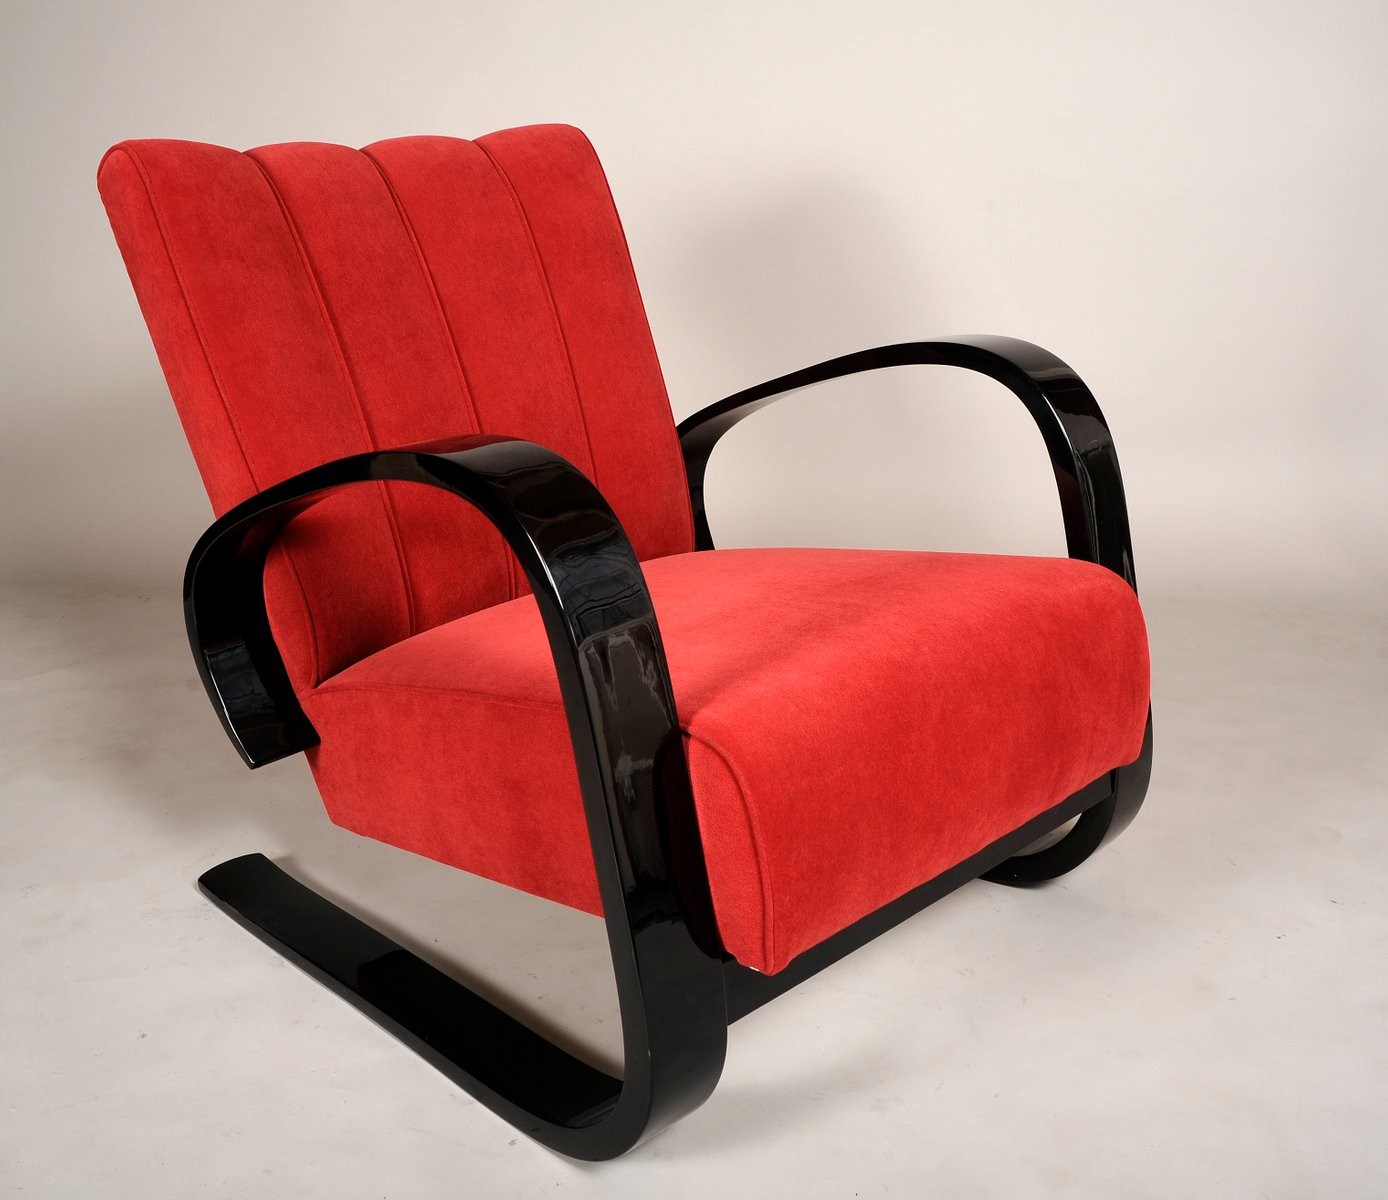 rote vintage sessel von alvar aalto 2er set bei pamono kaufen. Black Bedroom Furniture Sets. Home Design Ideas